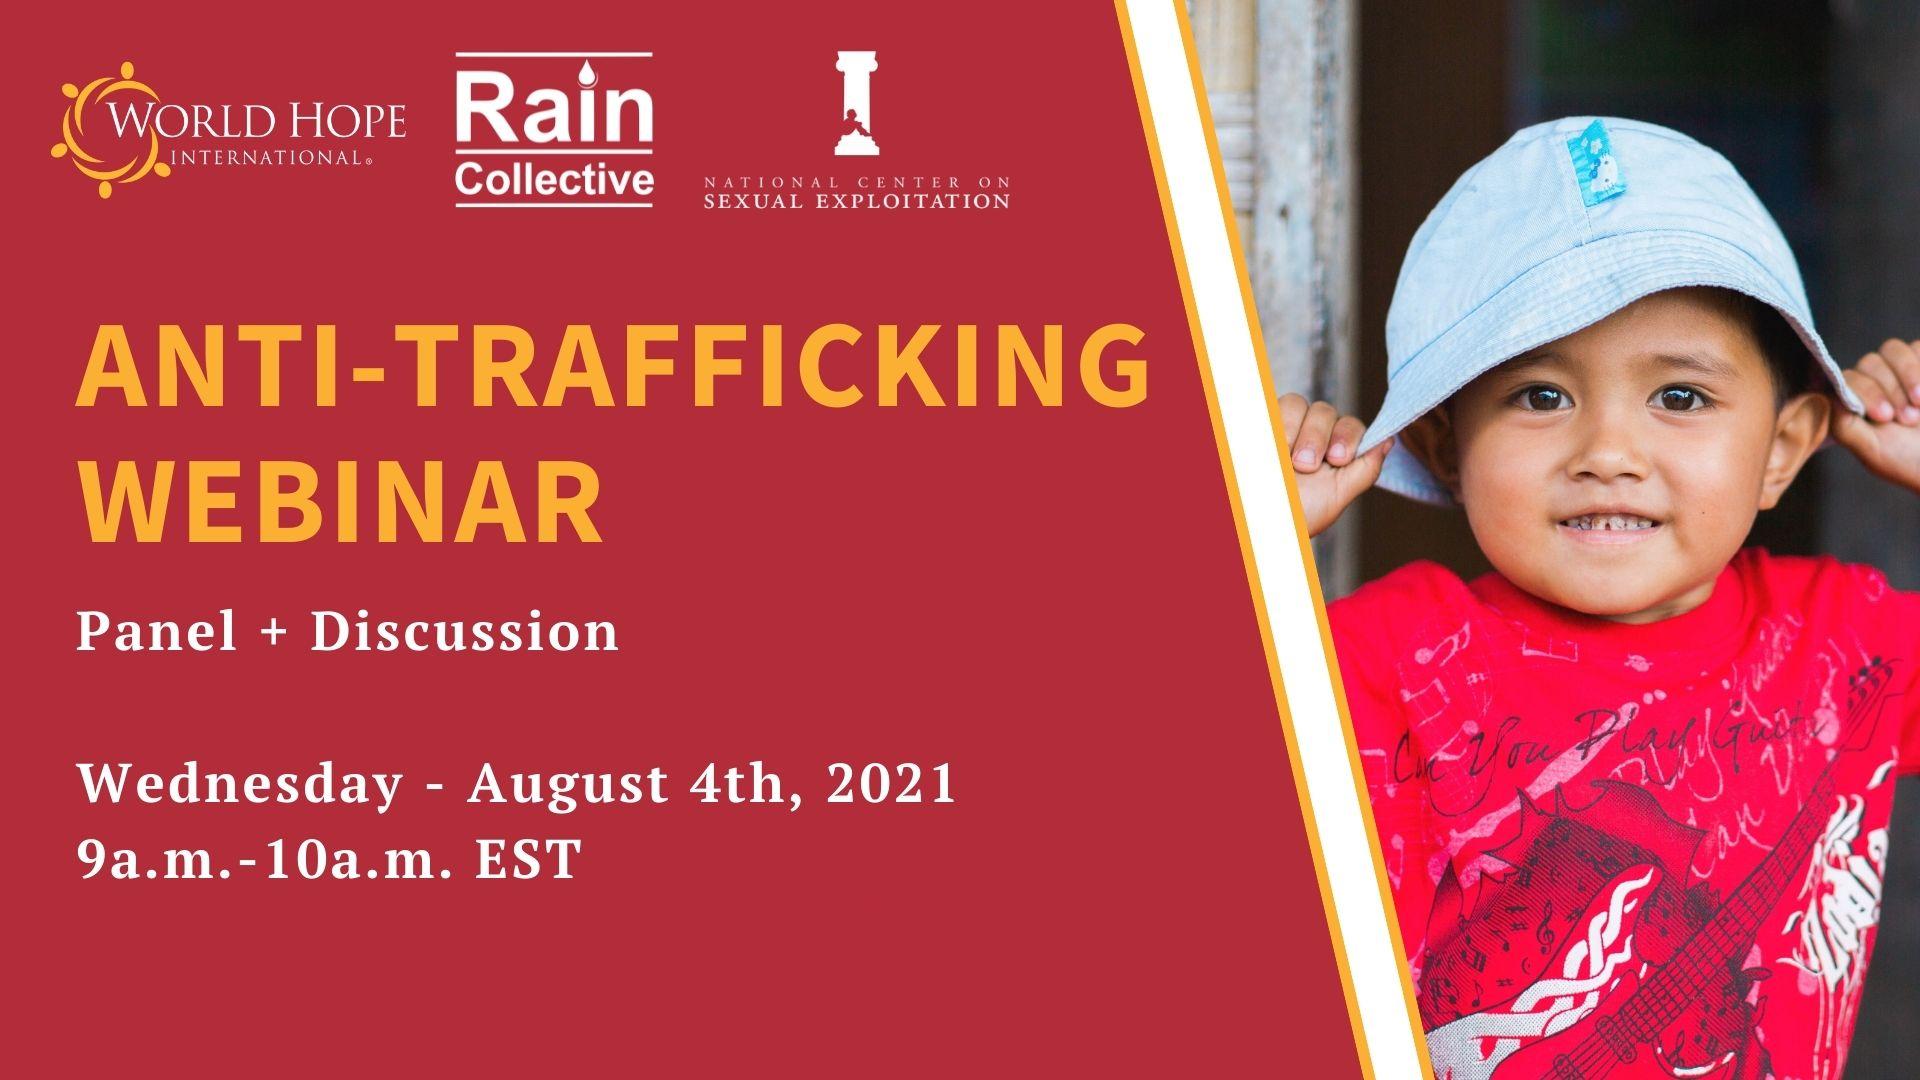 Event: Anti-Trafficking Webinar